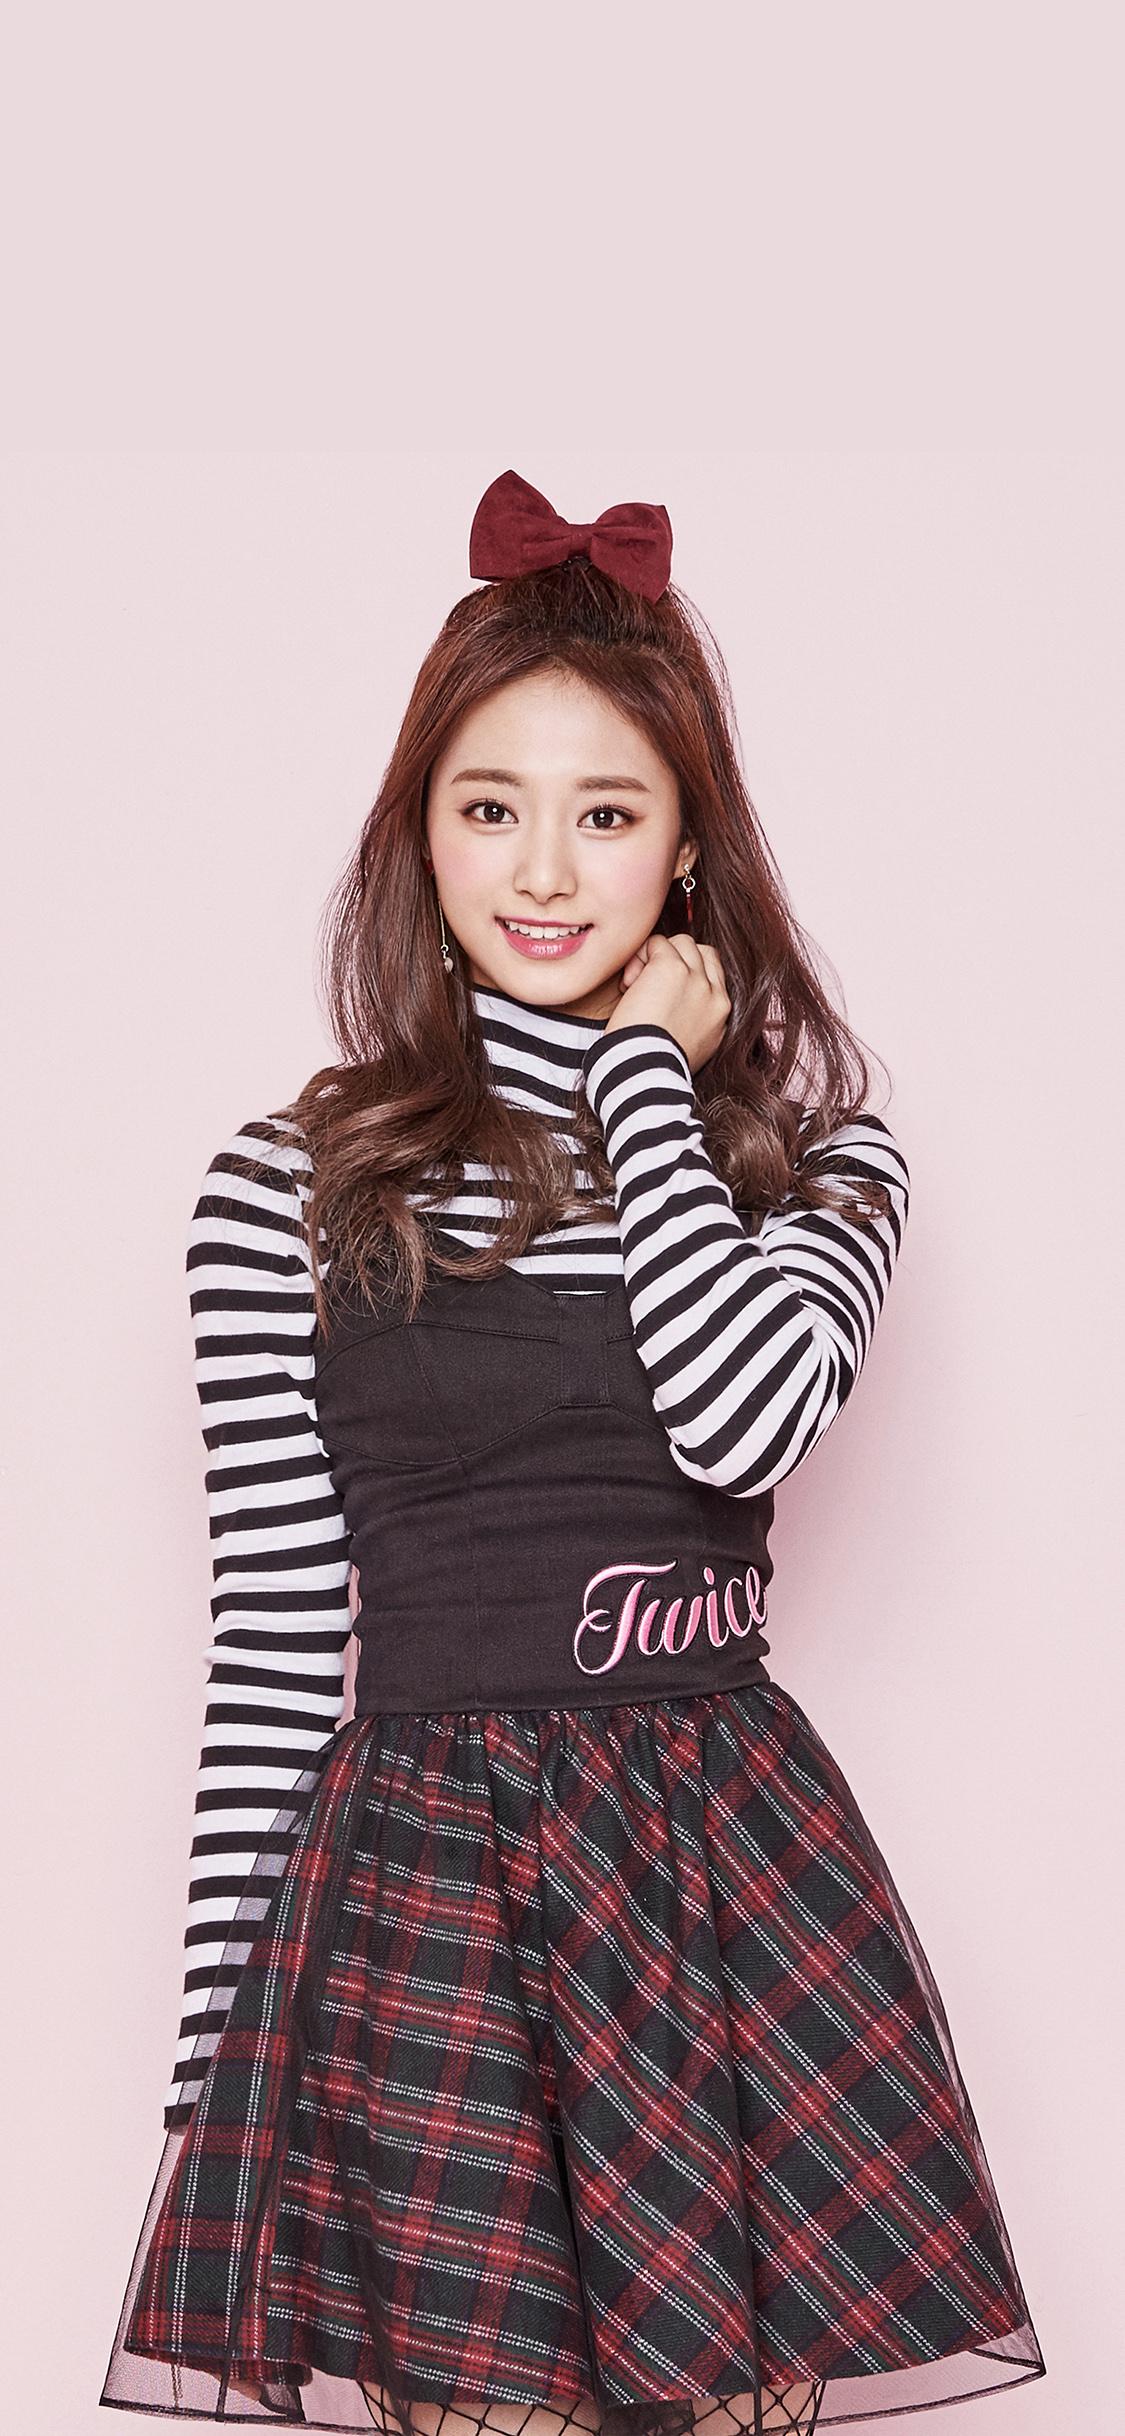 hm34-twice-kpop-tzuyu-pink-cute-wallpaper